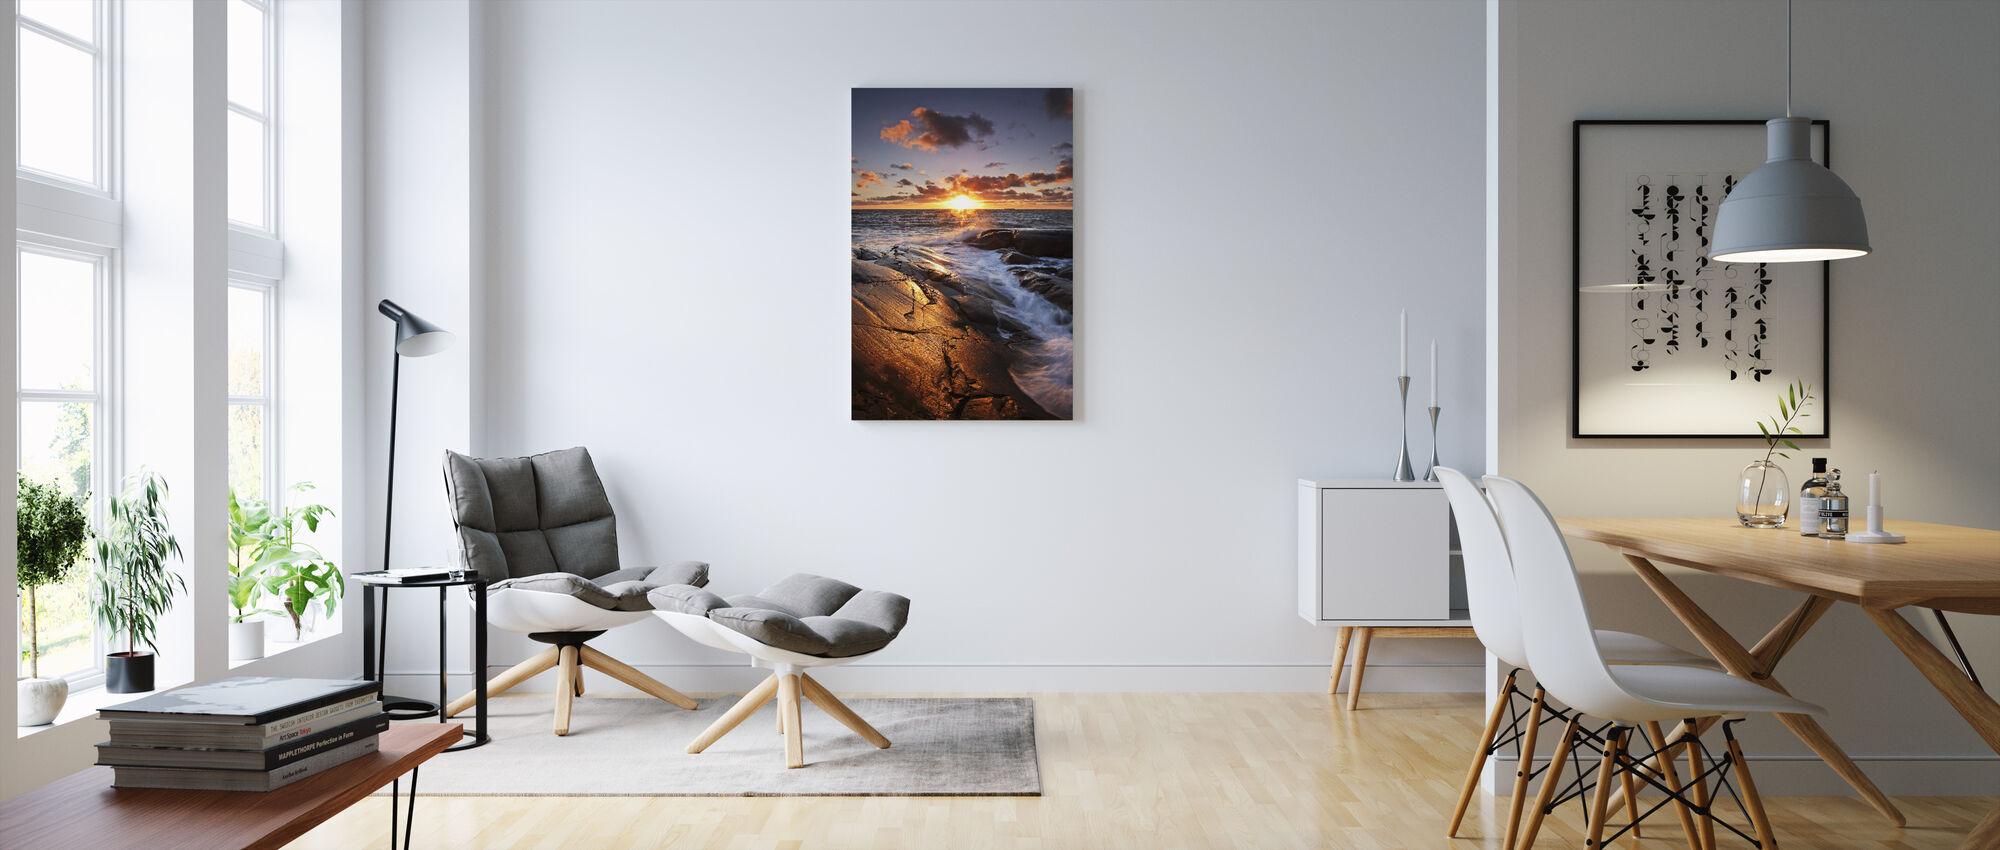 The Golden Rock - Canvas print - Living Room